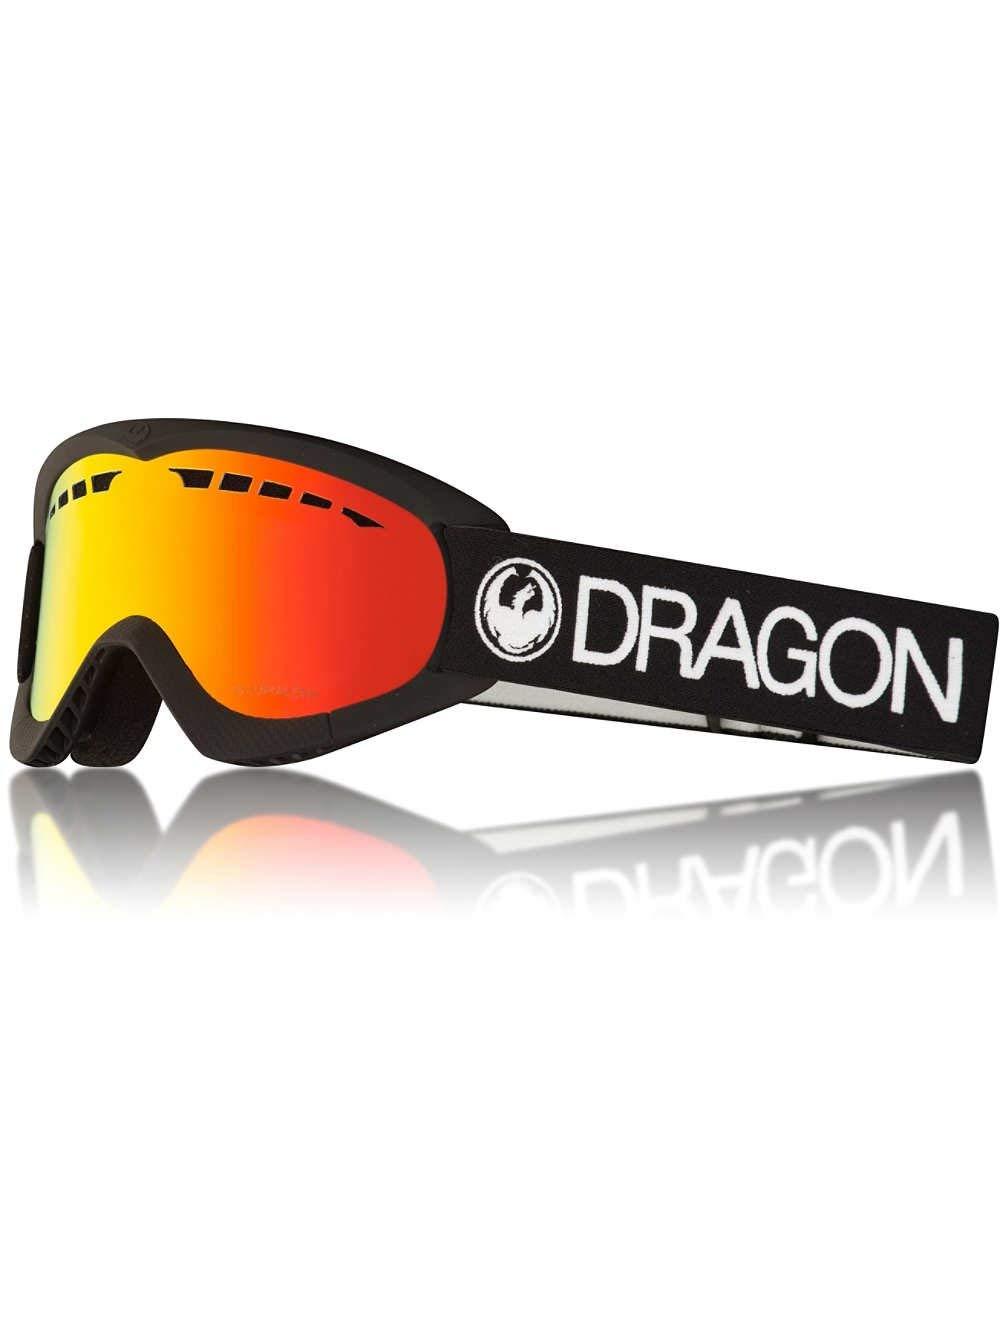 ce397ccf53ff Buy Dragon DXS Onboard Jet black ski snowboard goggles New DRAGON in ...